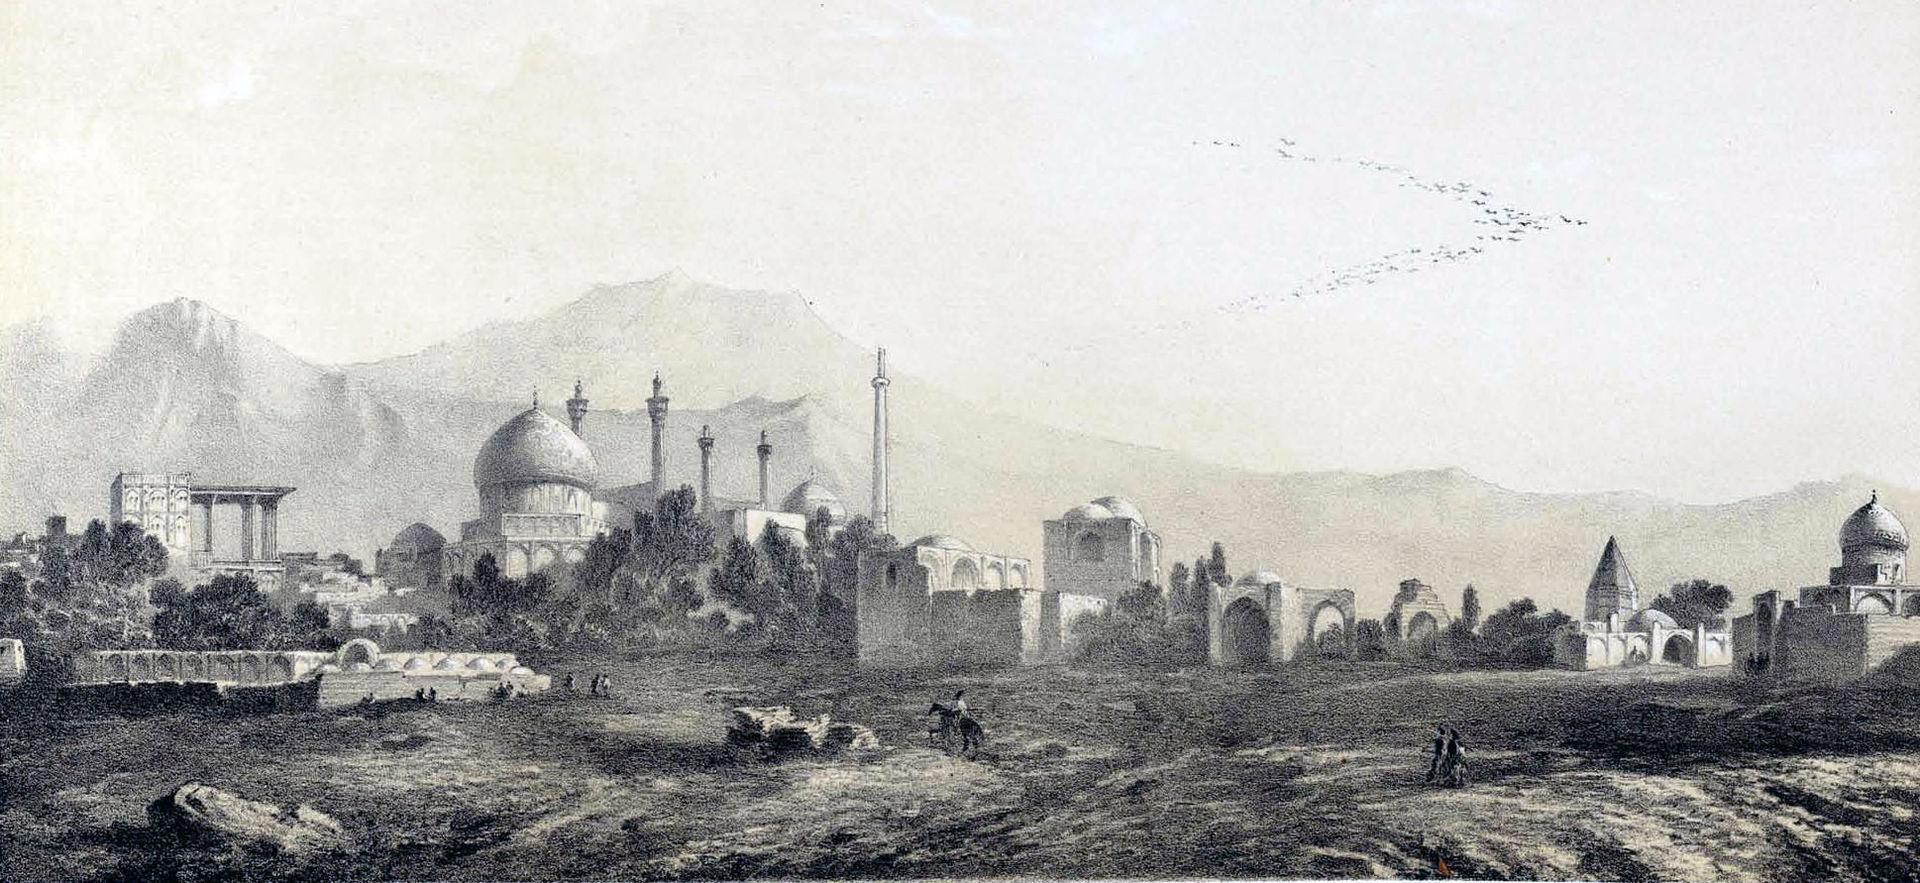 scpisfahanpic.jpg